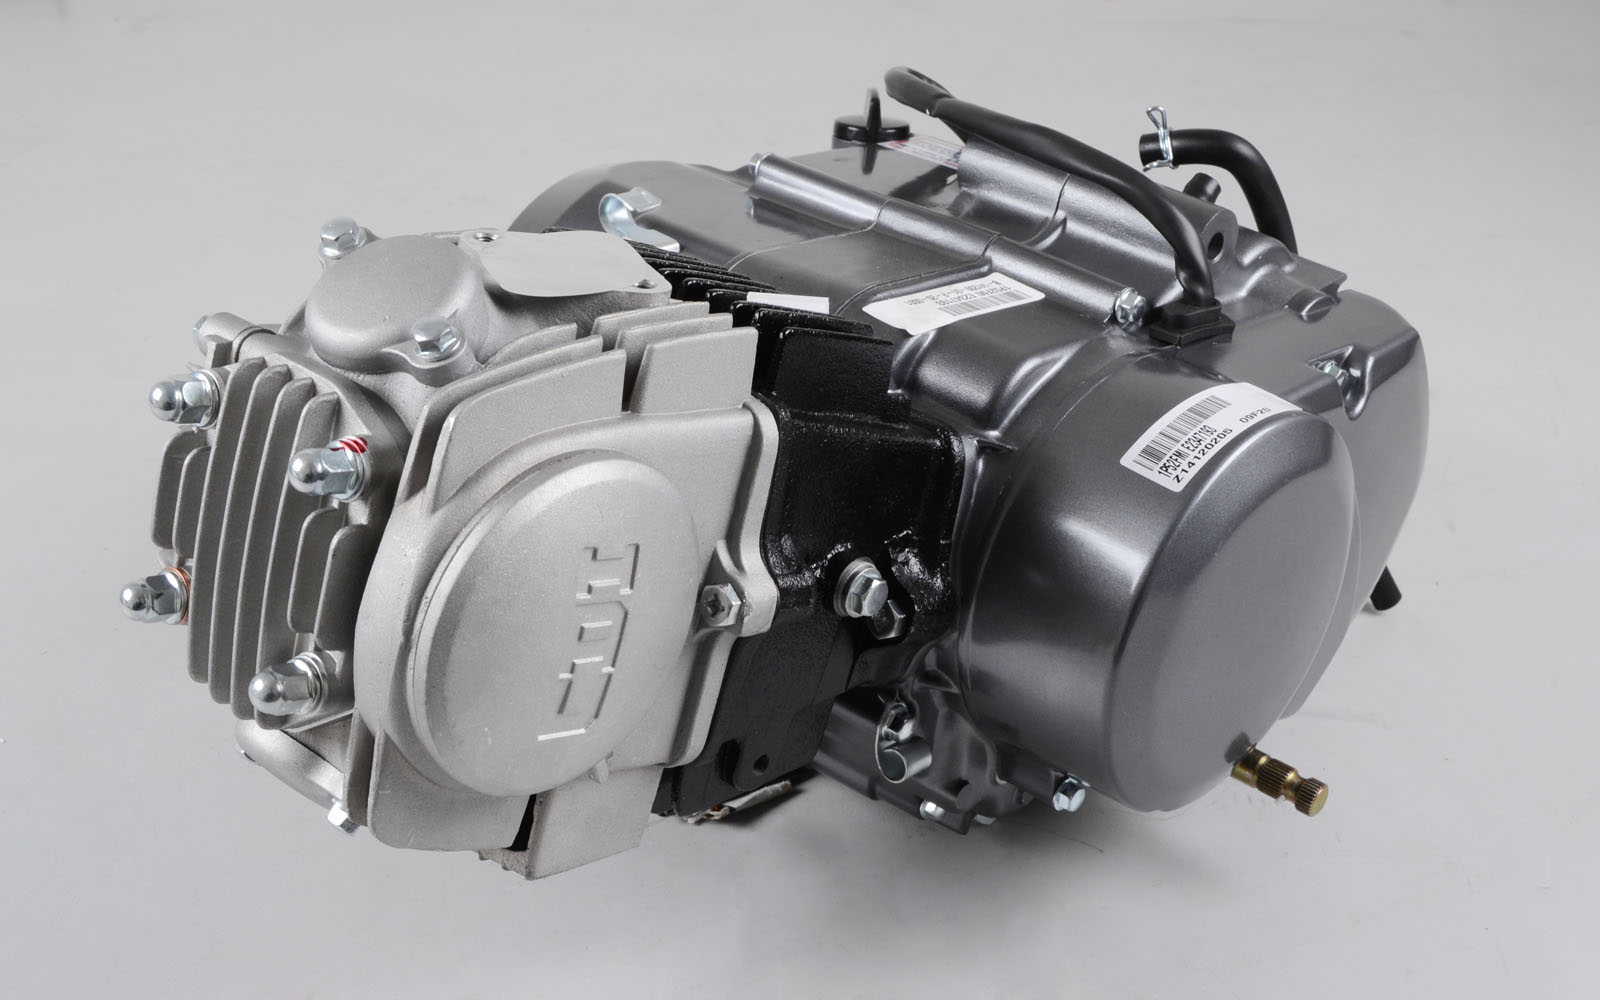 lifan 125cc motor engine 1p54fmi manuell 1 0 2 3 4 cross. Black Bedroom Furniture Sets. Home Design Ideas